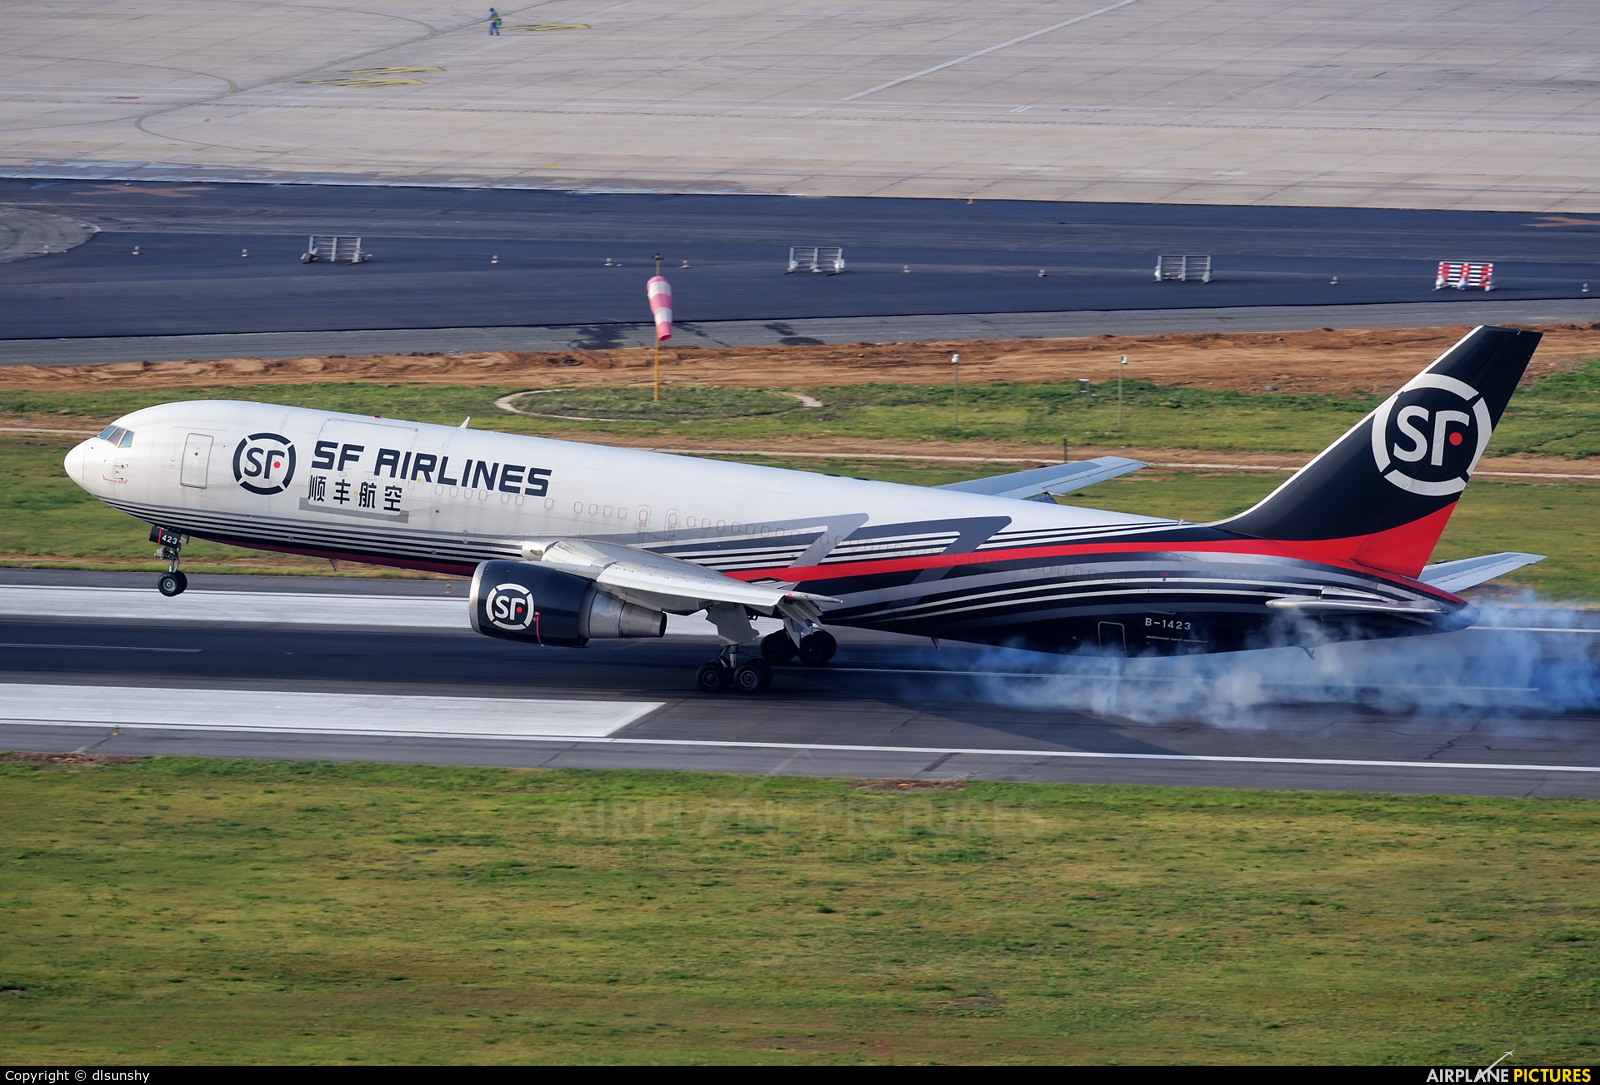 SF Airlines B-1423 aircraft at Dalian Zhoushuizi Int'l